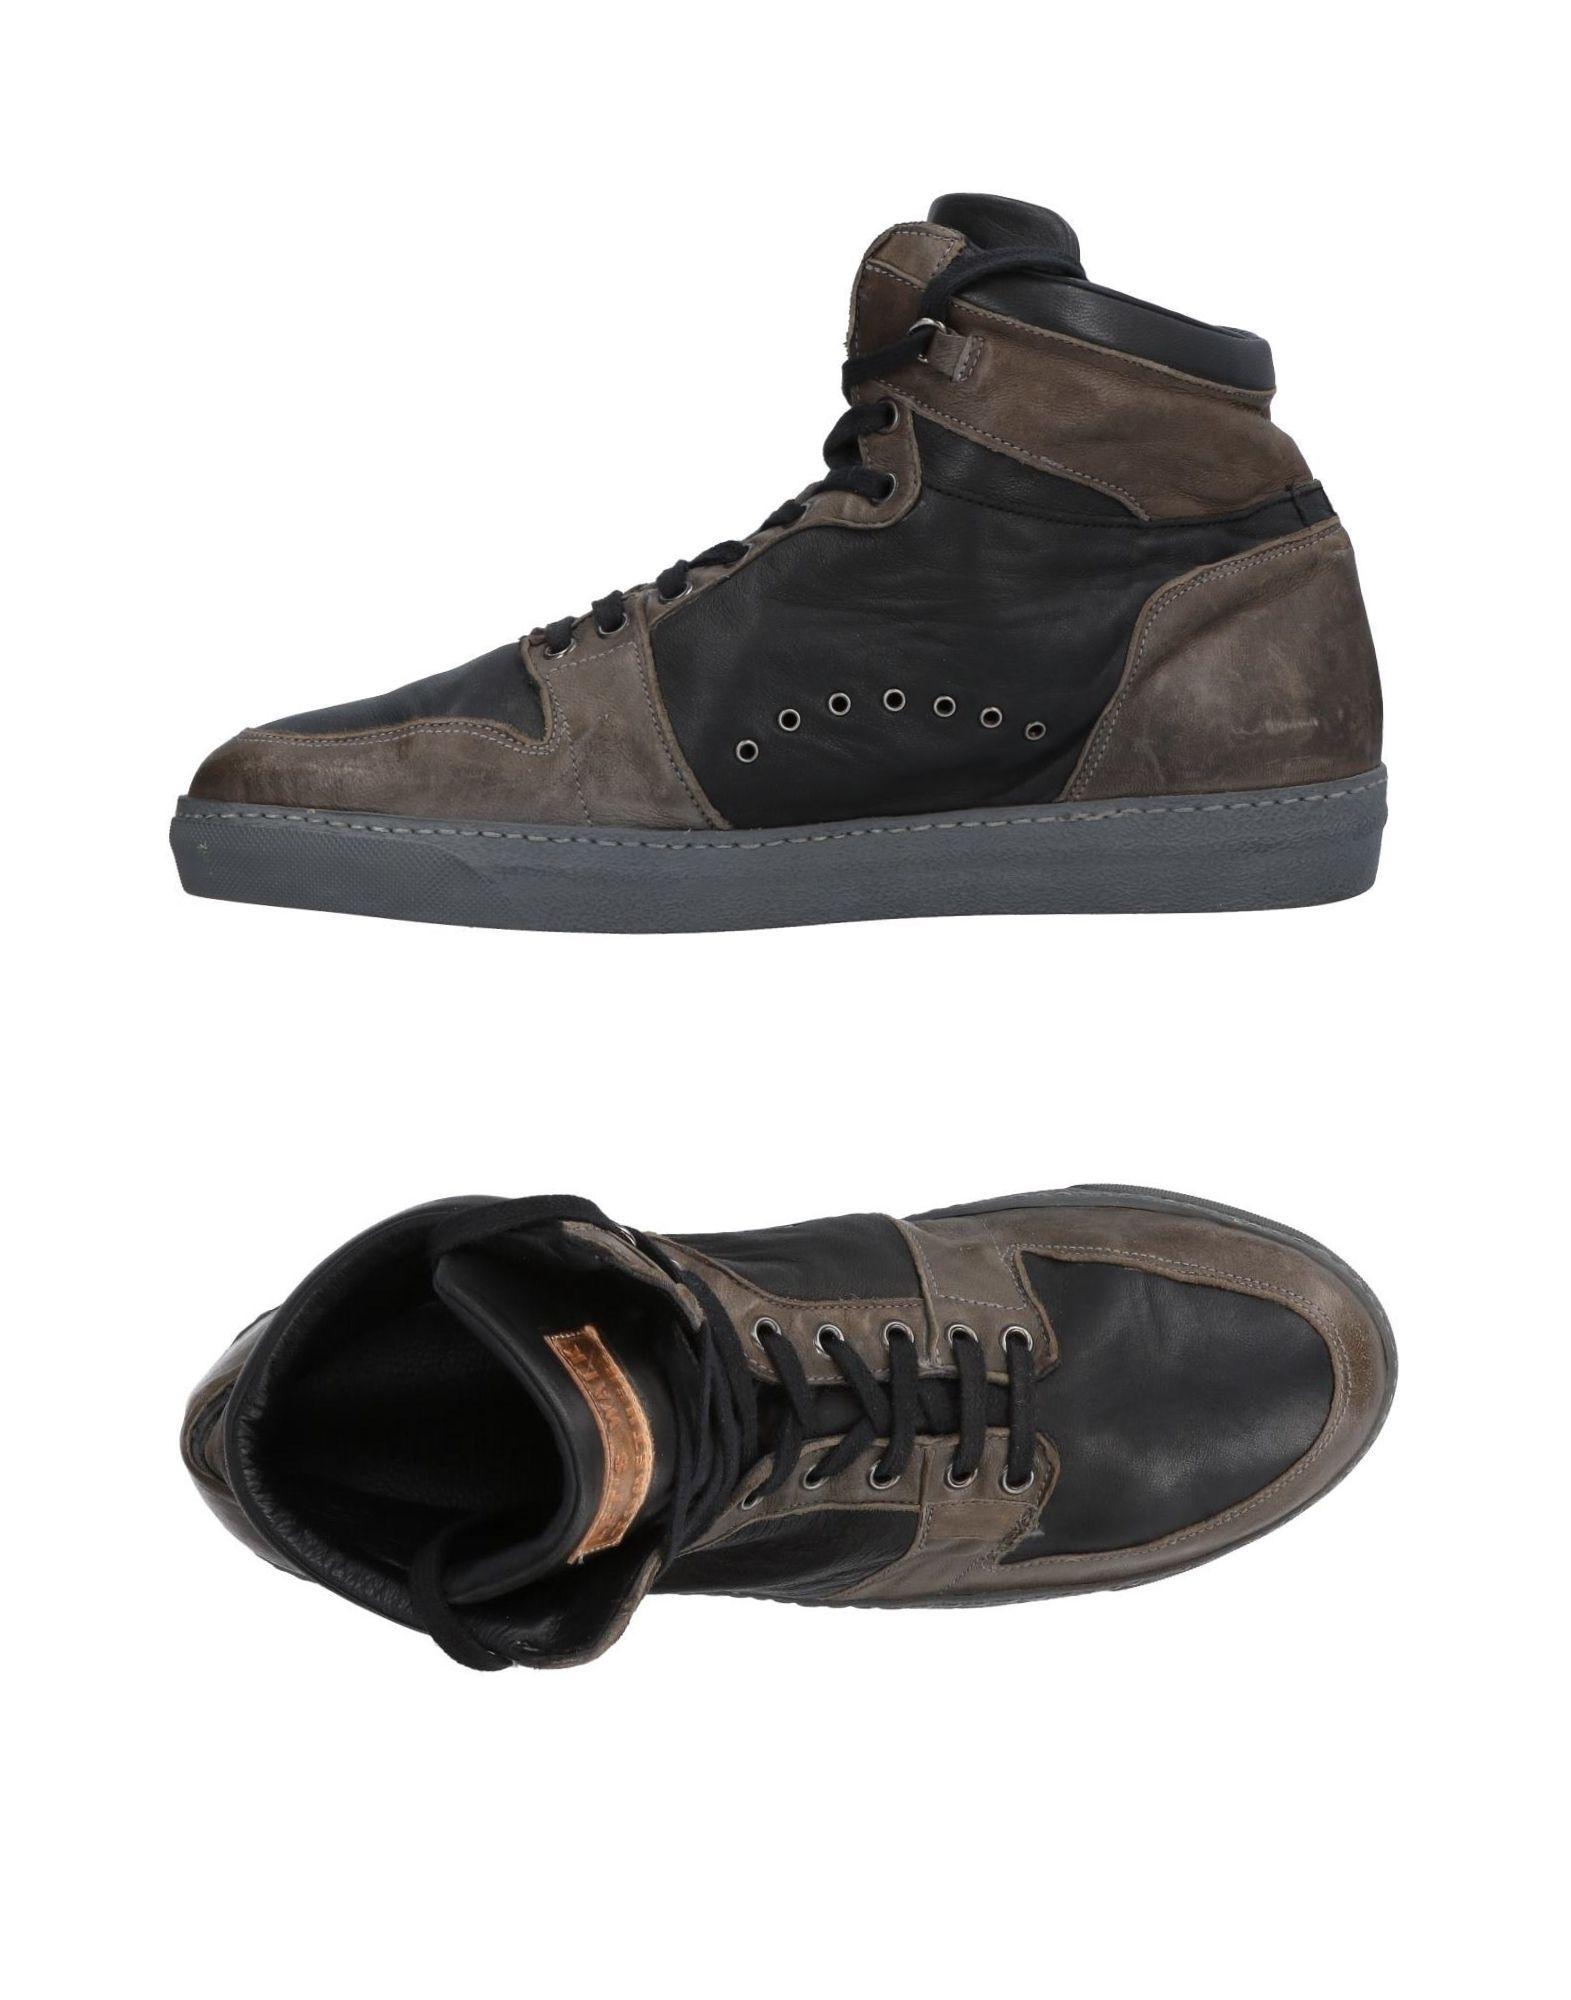 Sneakers Giorgio Brato Homme - Sneakers Giorgio Brato  Noir Mode pas cher et belle